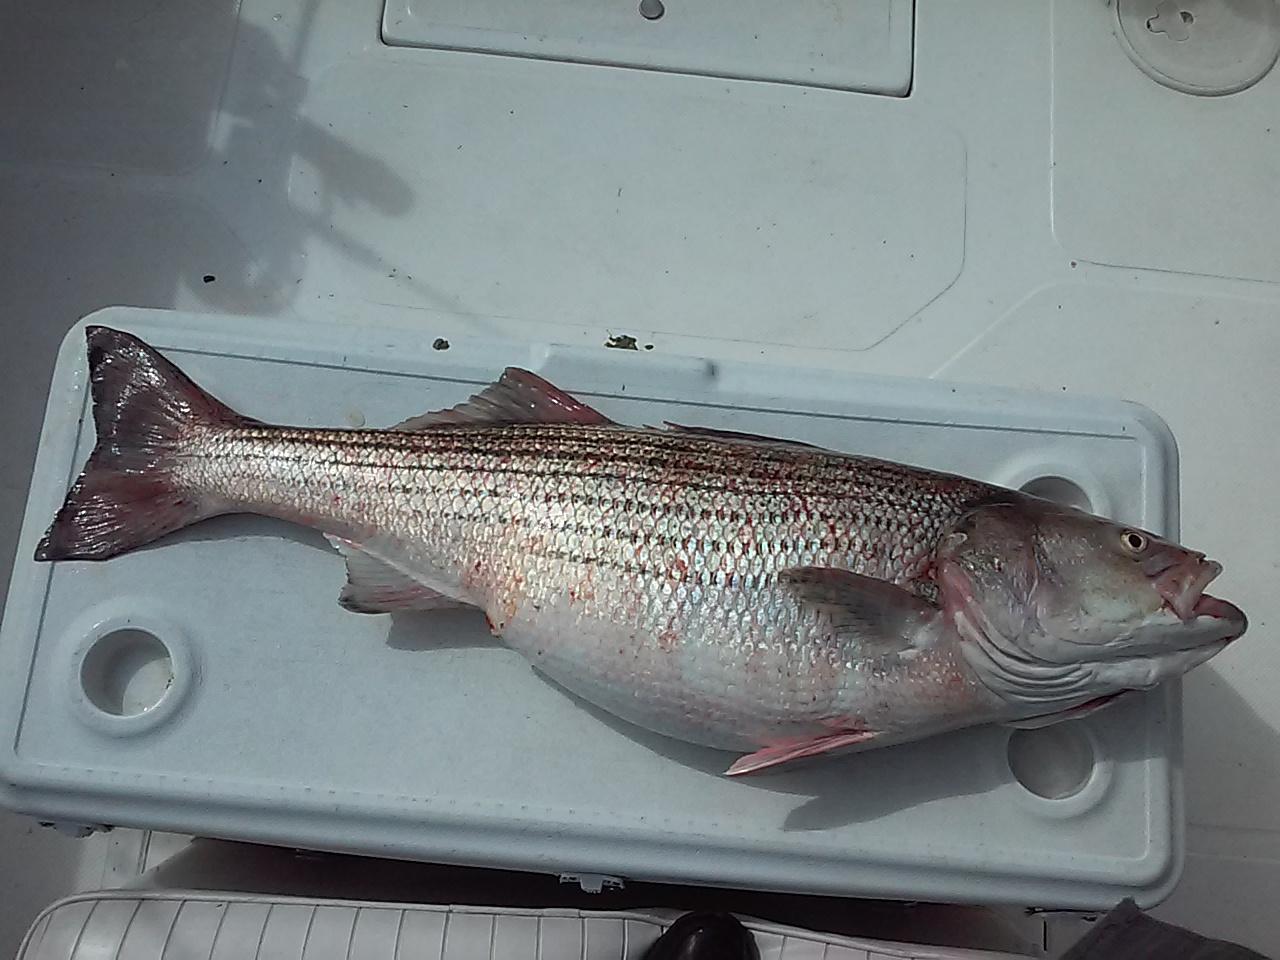 Hudson river striper report includes this fish